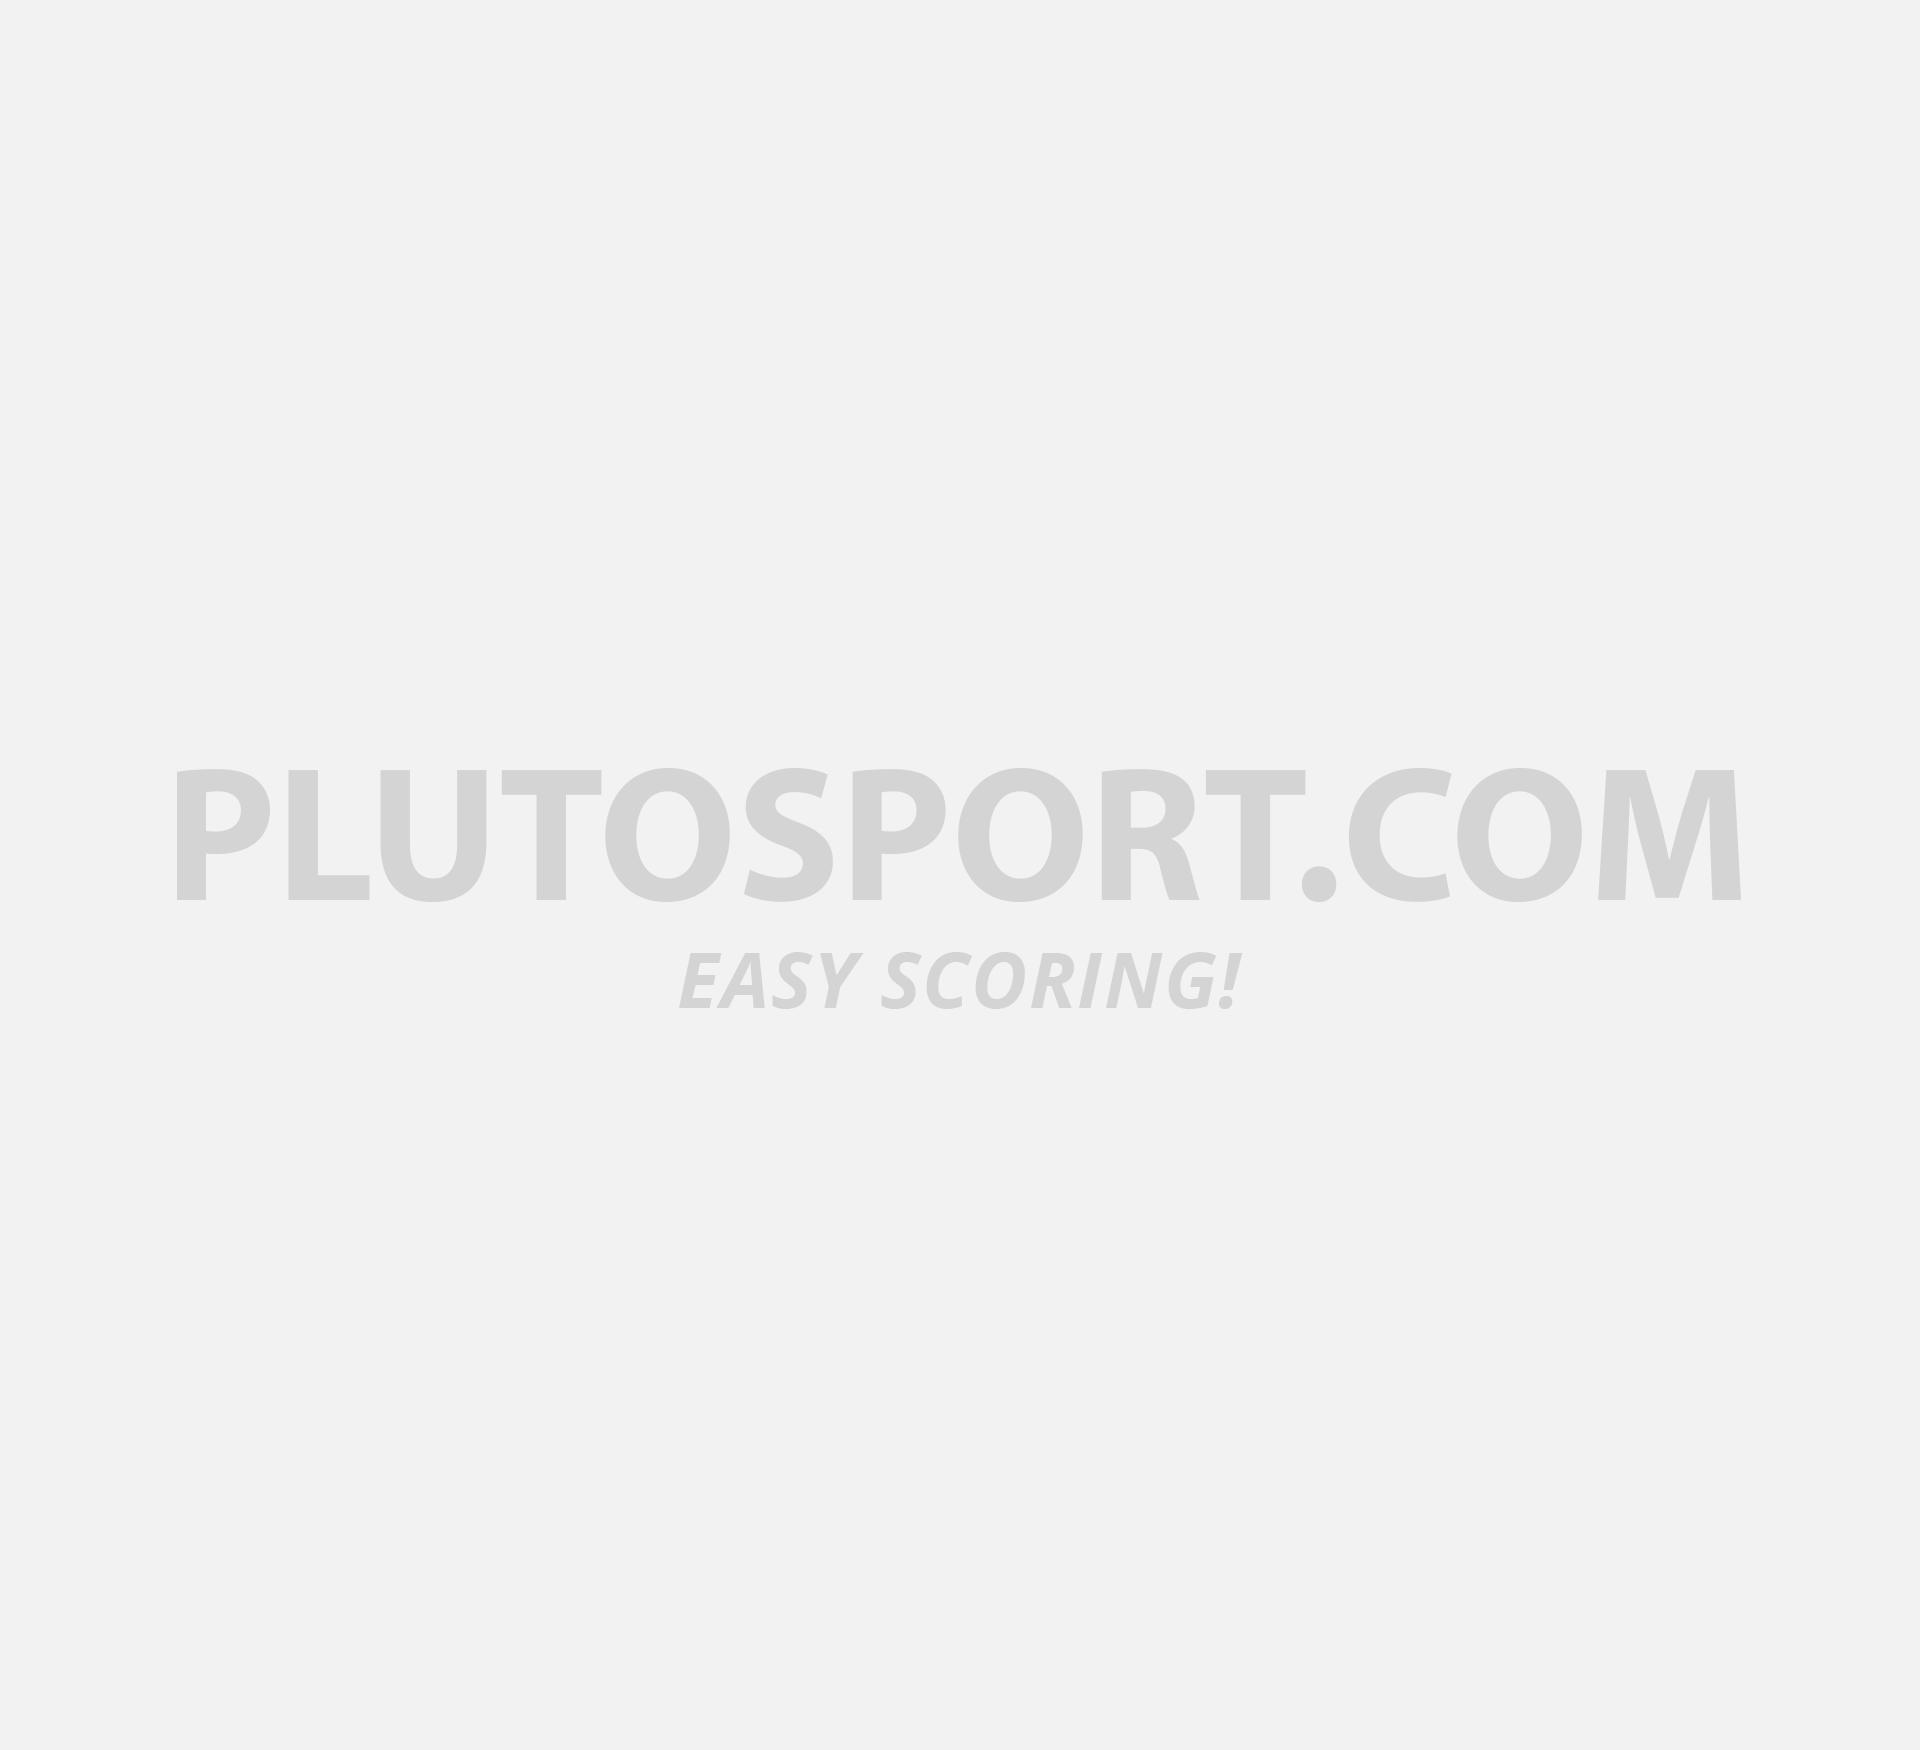 74942ad0d470 Fila Tape Track Pants - Sweat - Pants - Clothing - Lifestyle - Sports    Plutosport